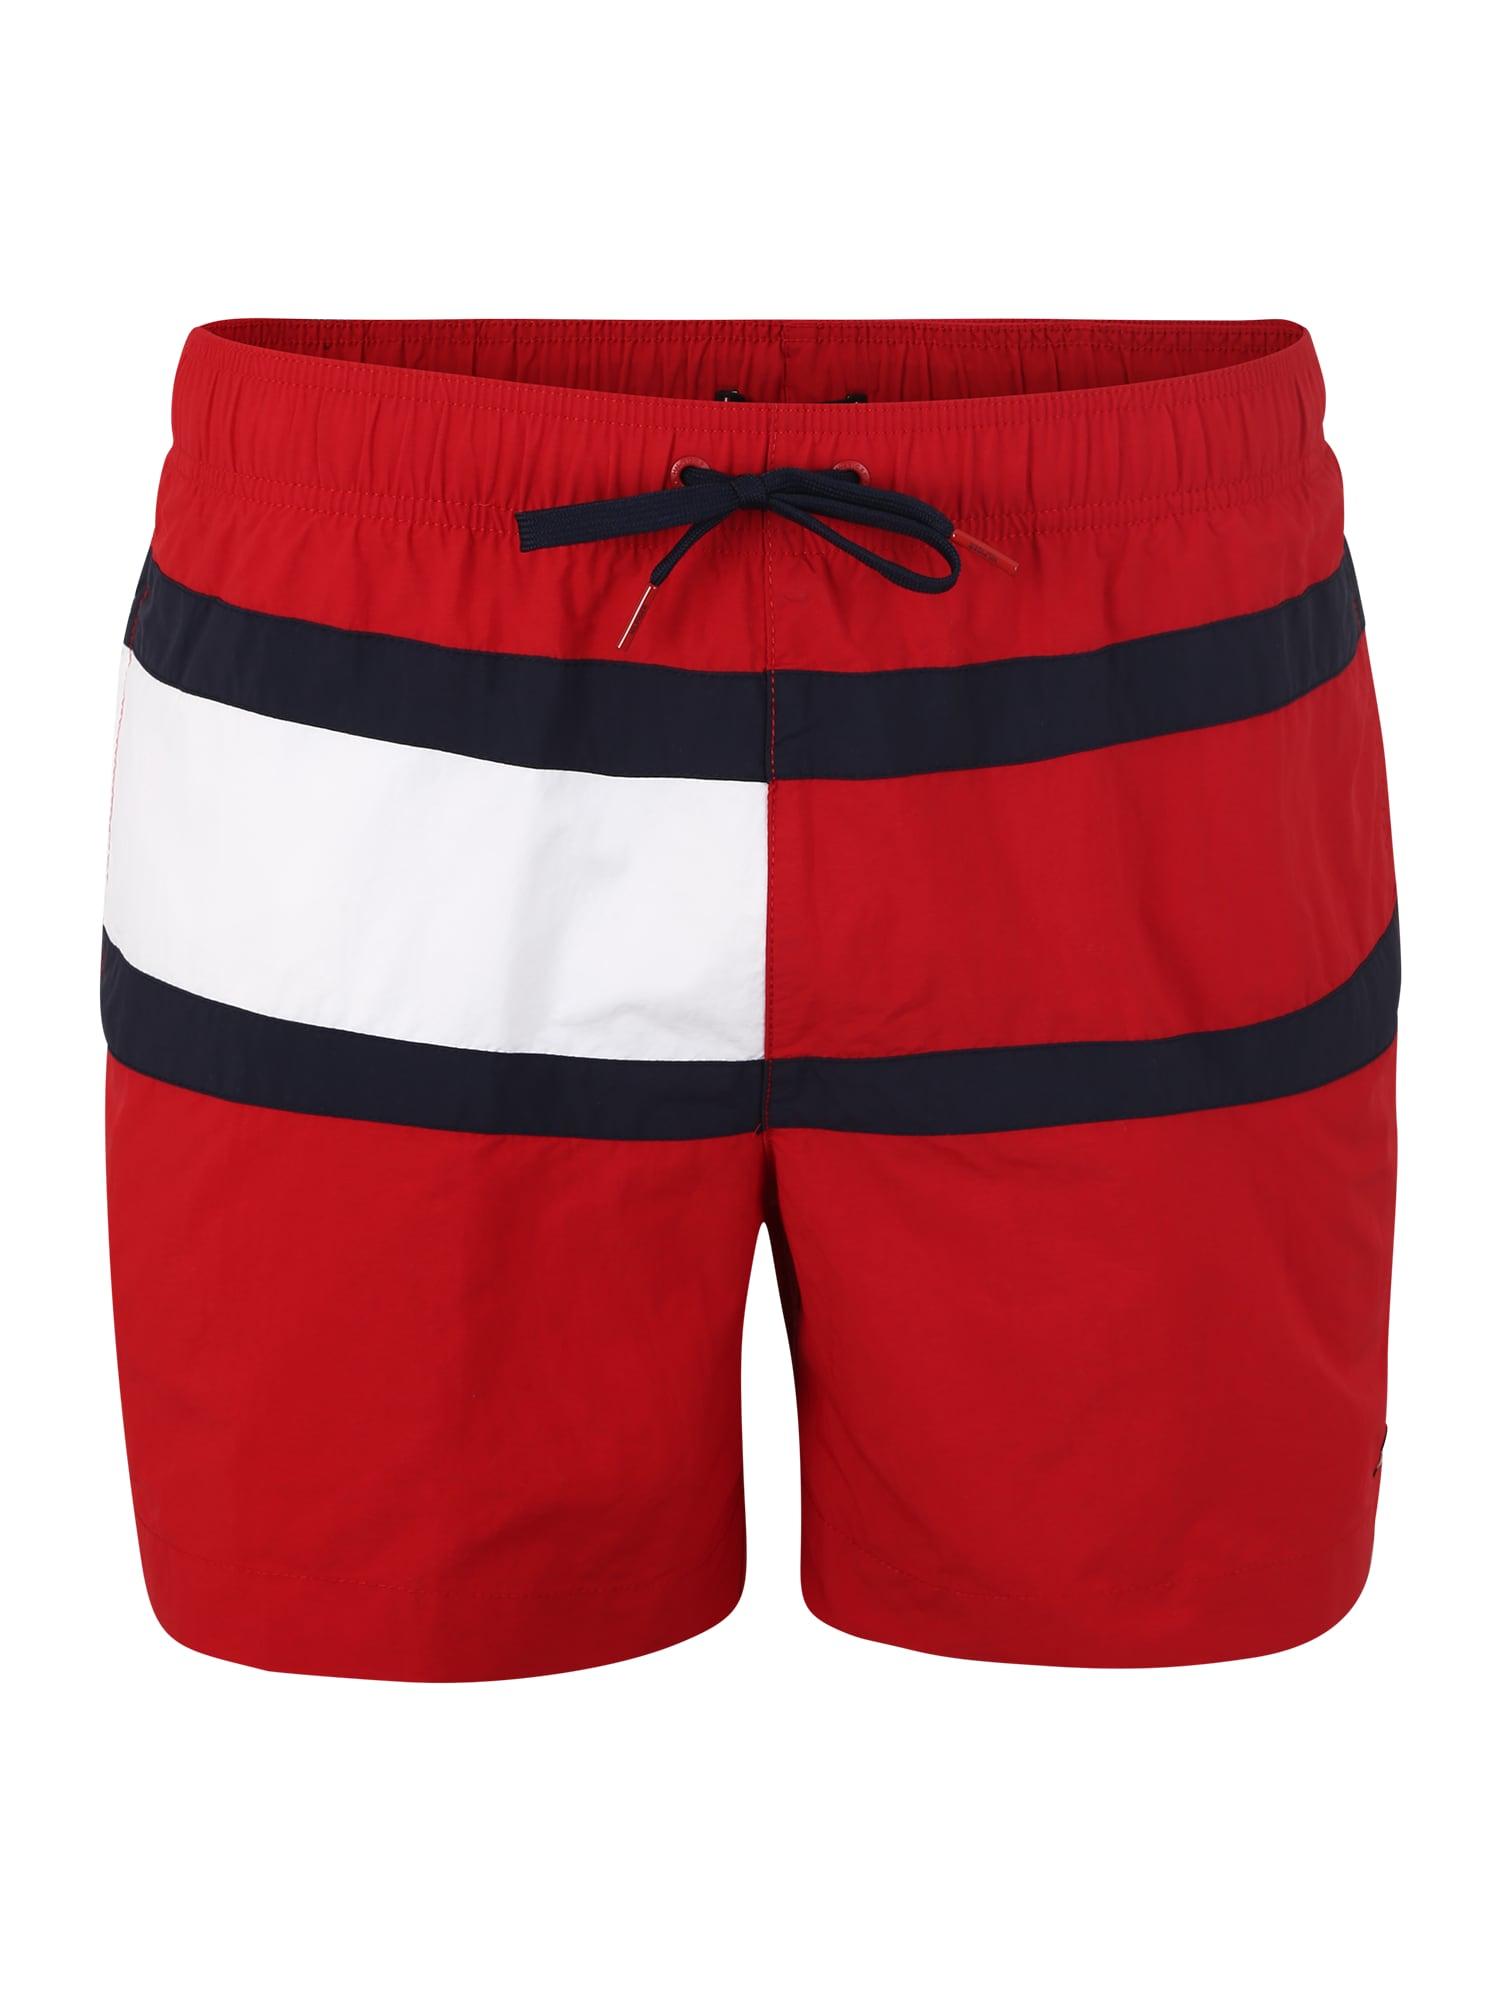 Plavecké šortky MEDIUM DRAWSTRING červená Tommy Hilfiger Underwear